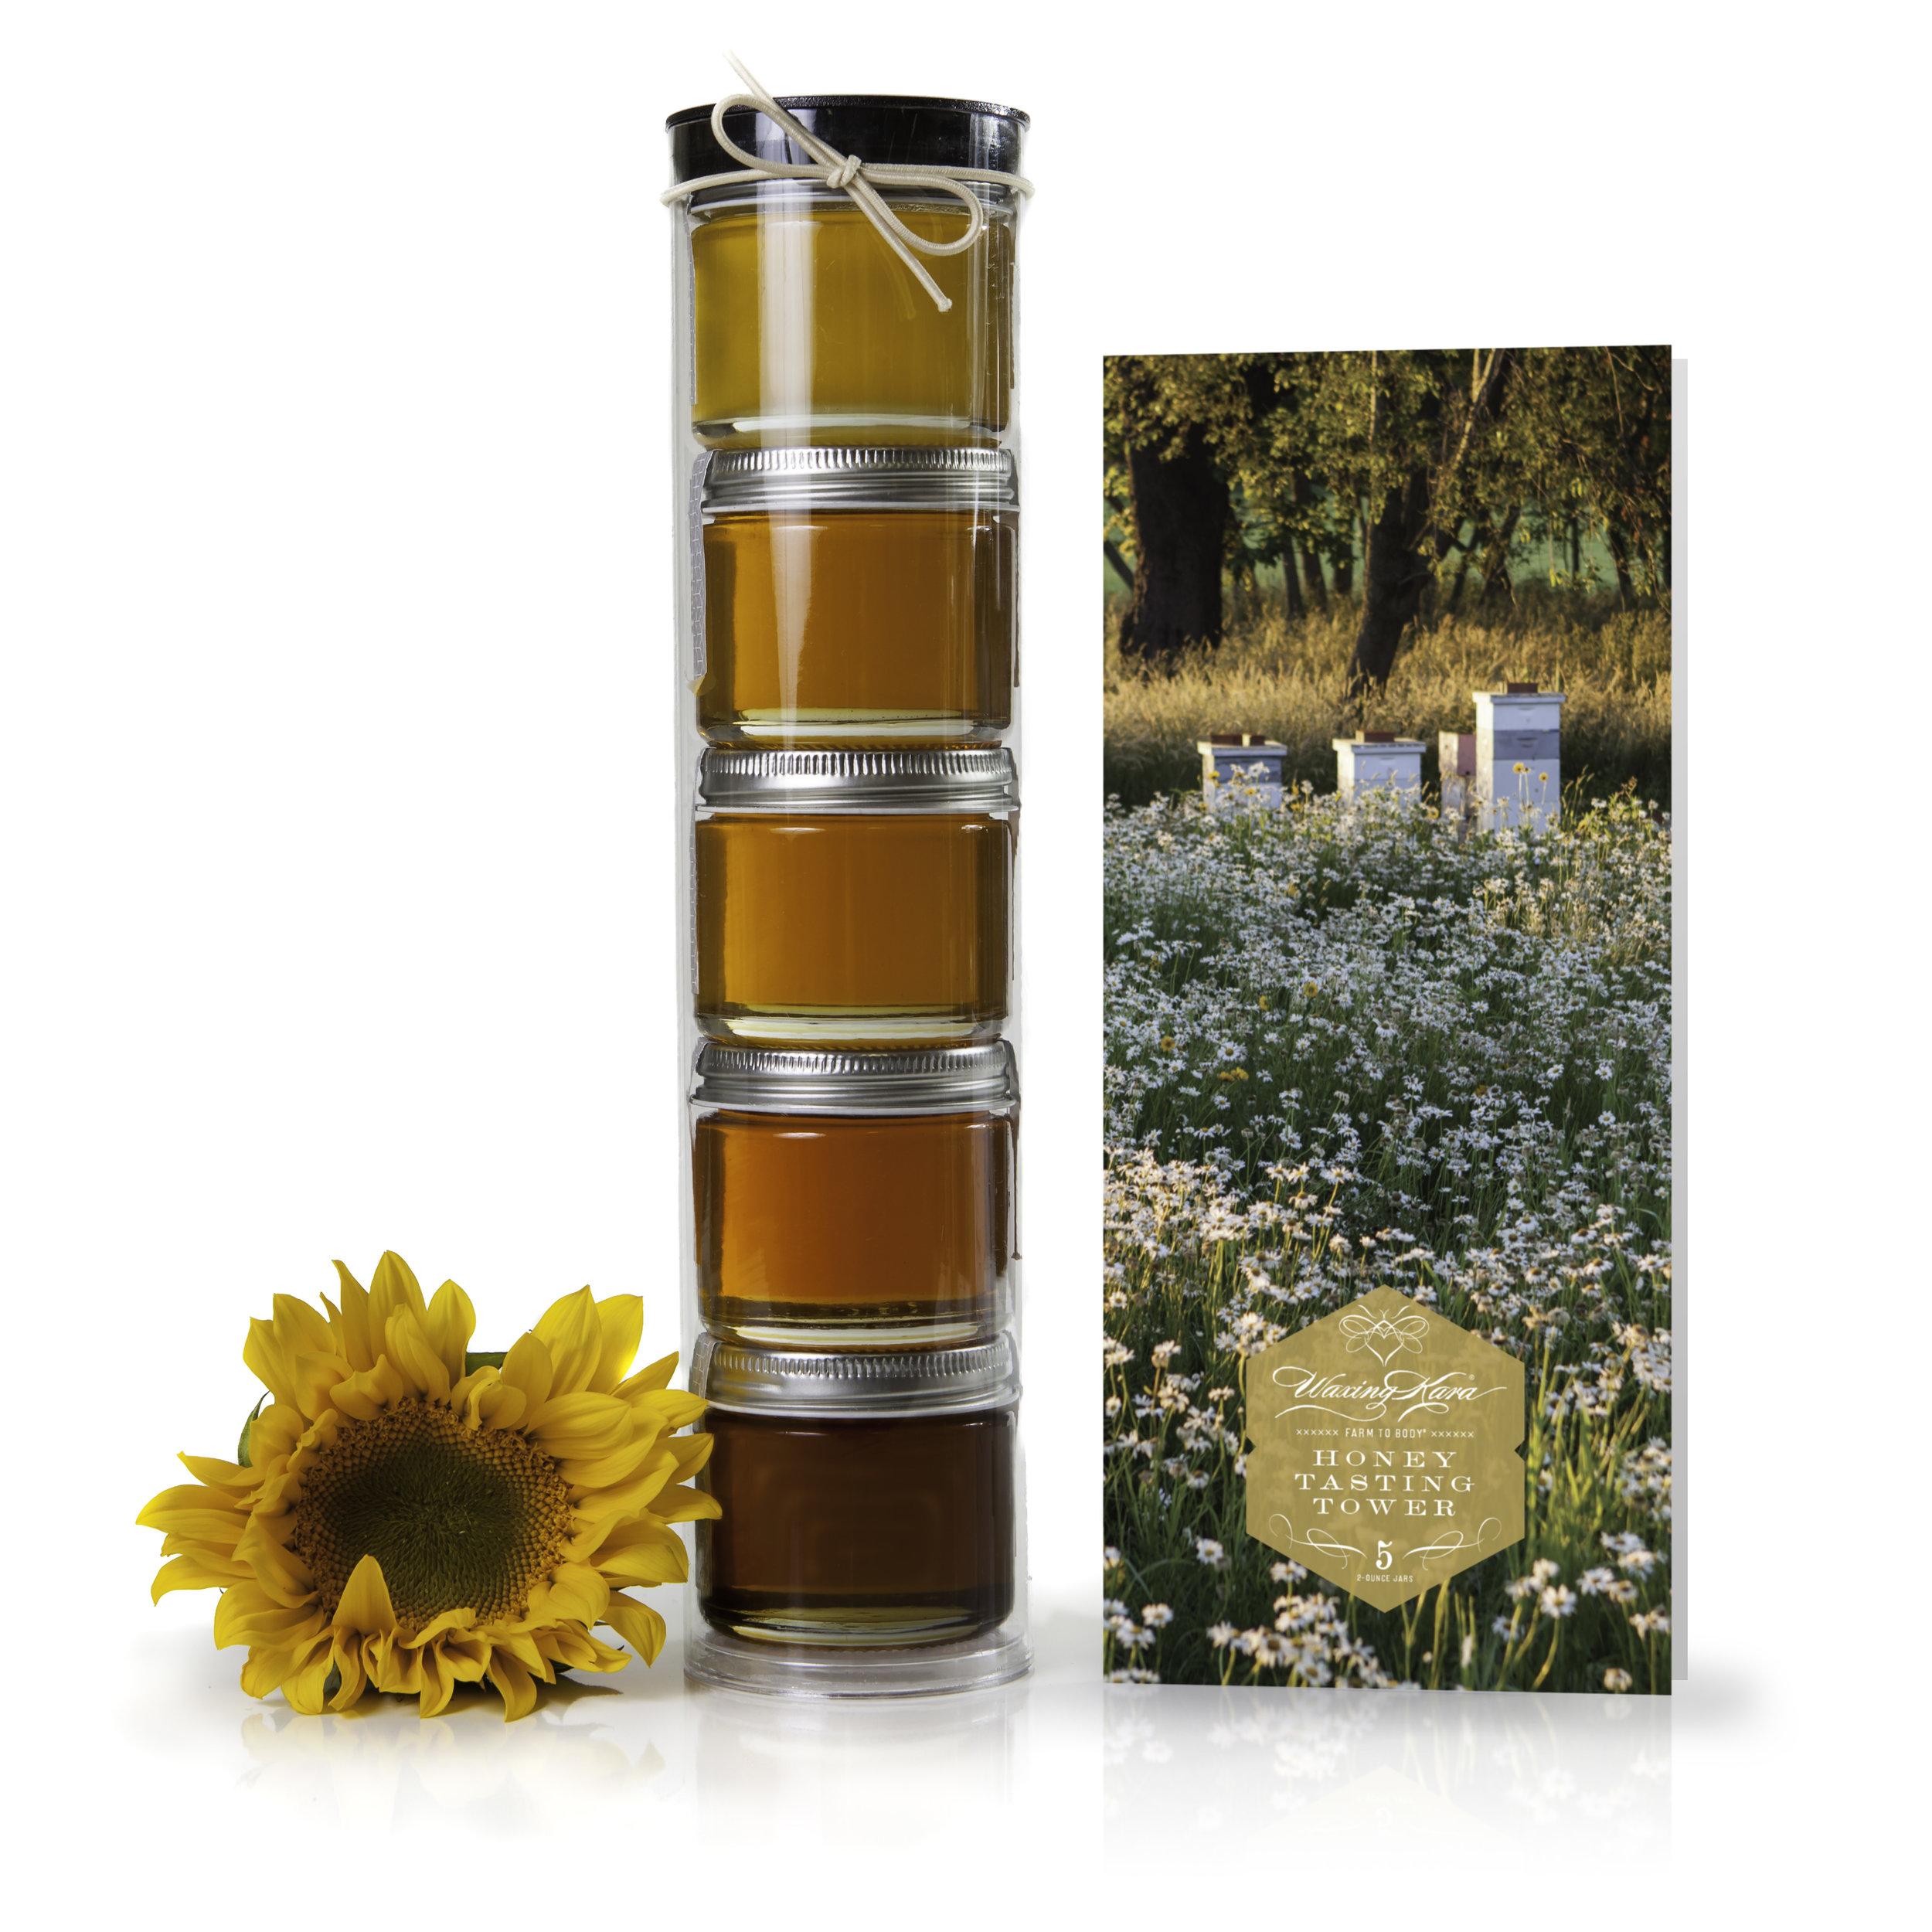 Domain- Waxing Kara-Honey Tasting Tower.jpg